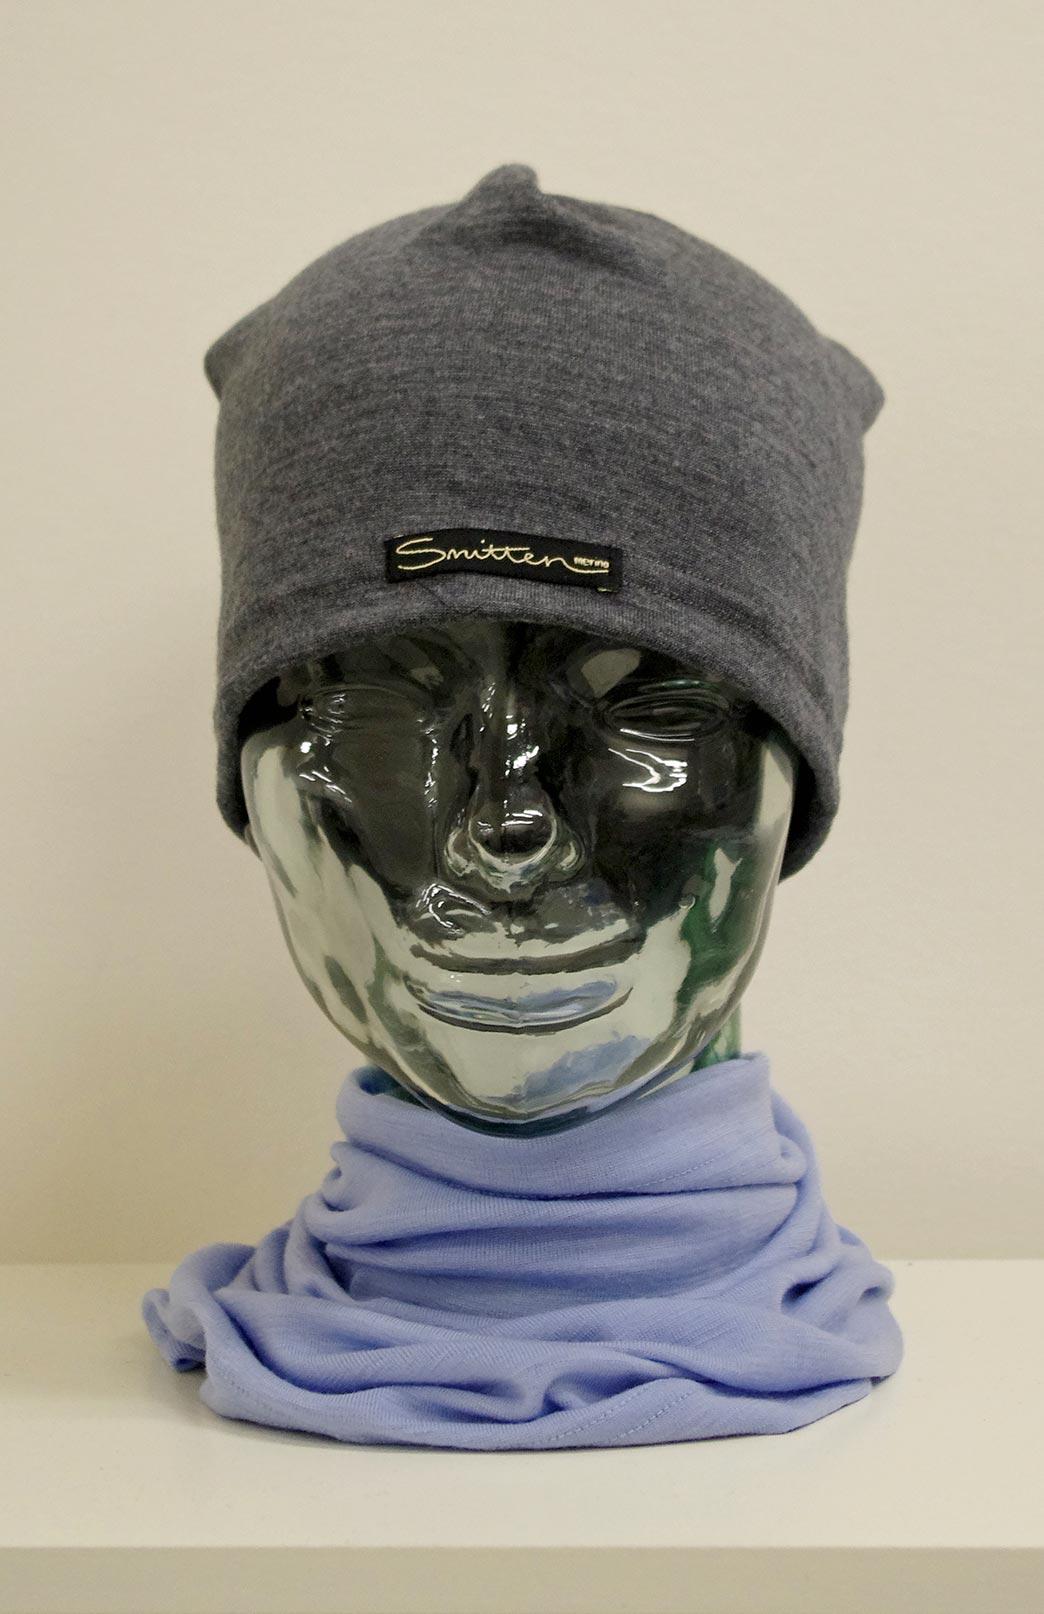 Beanie - Mid-weight Loose Fit Skull Cap - Unisex Grey Marl Merino Wool Loose Fit Beanie Skull Cap - Smitten Merino Tasmania Australia